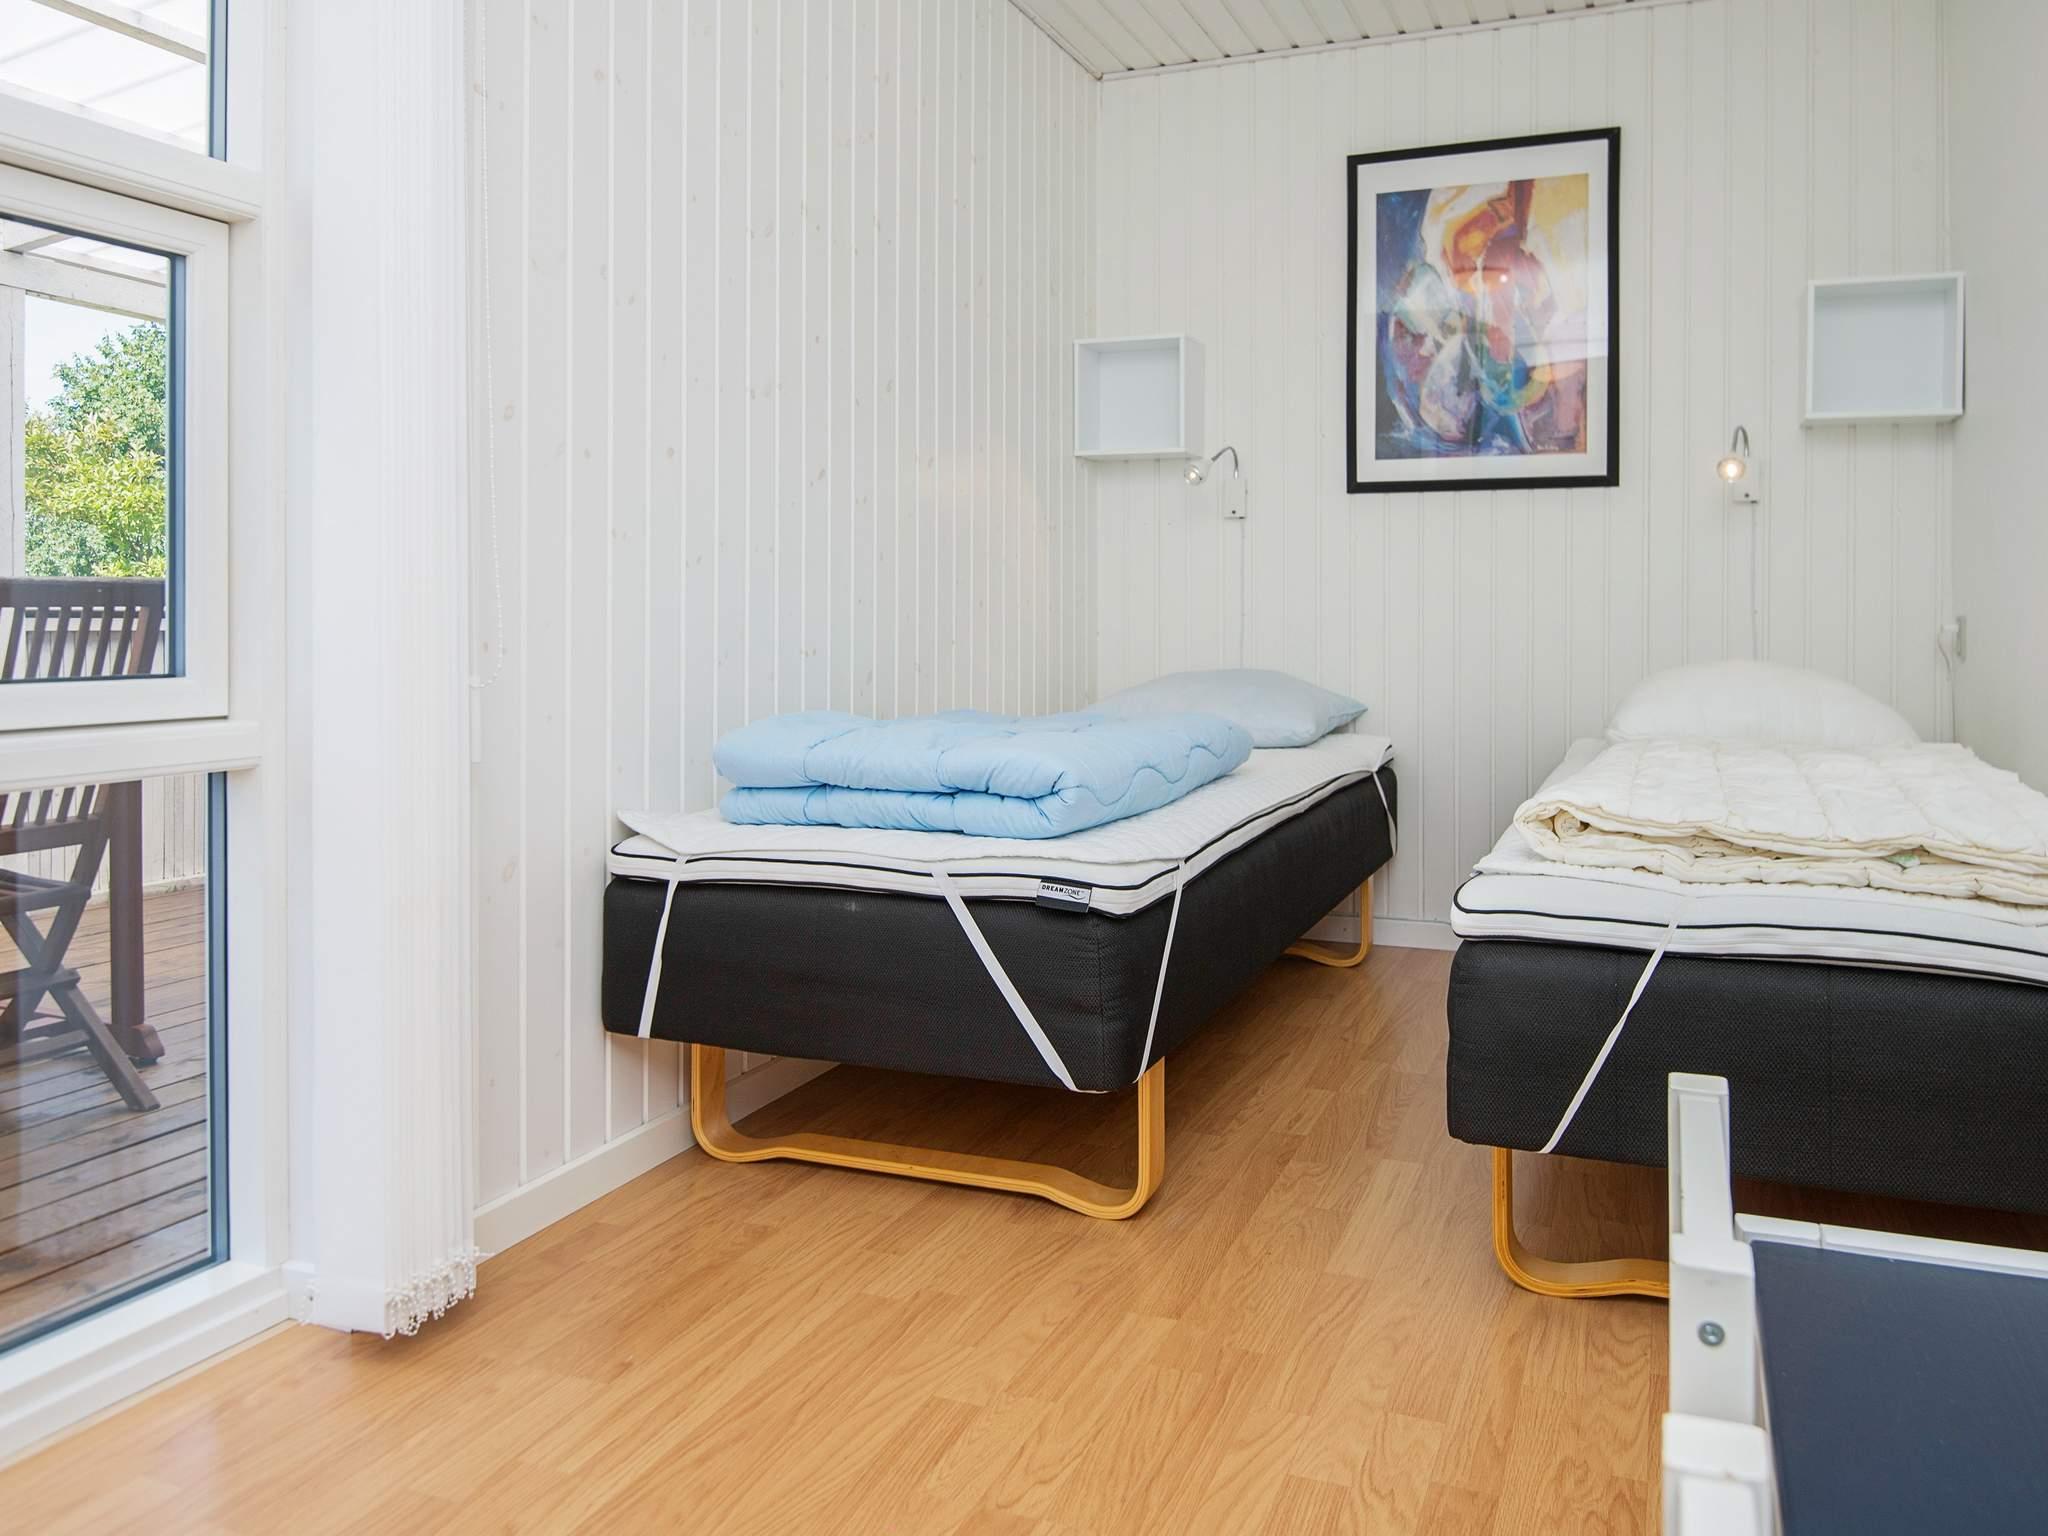 Maison de vacances Helgenæs (978615), Knebel, , Mer Baltique danoise, Danemark, image 9